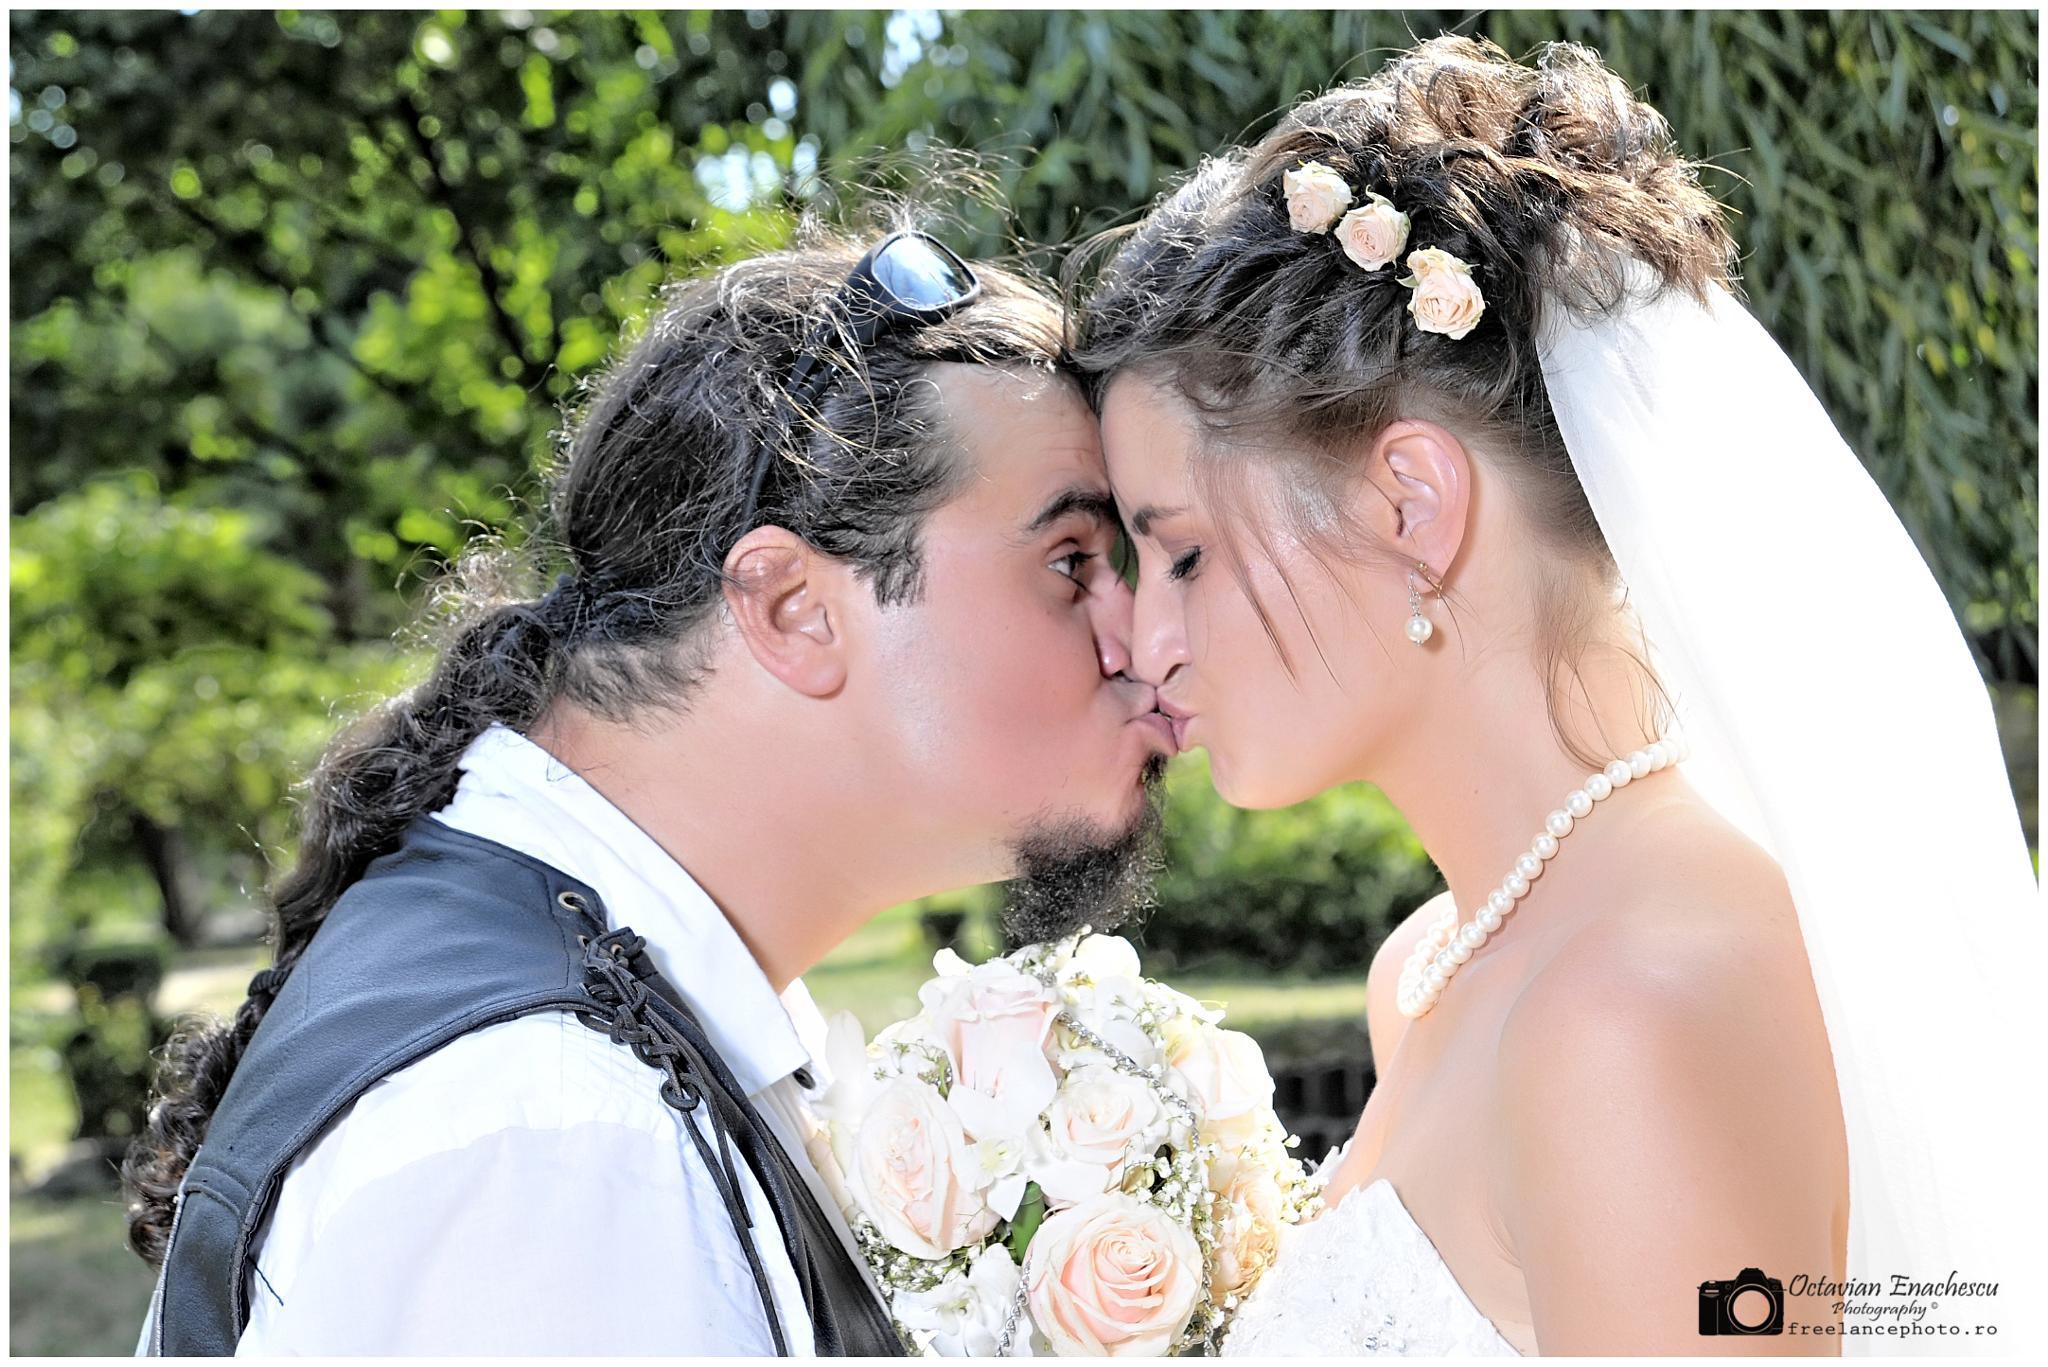 Best Kiss by Octavian Enachescu